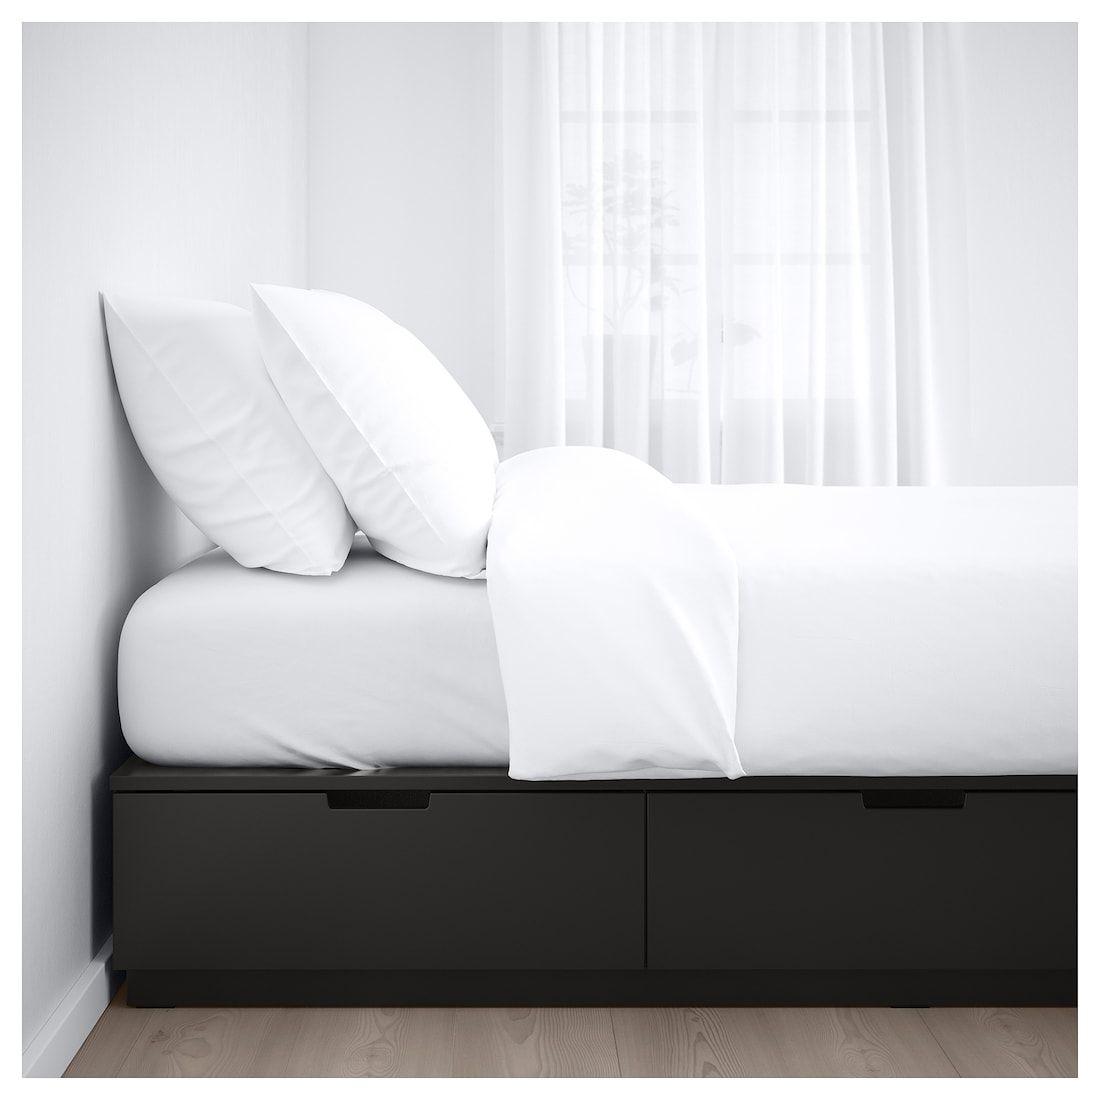 Nordli Bettgestell Mit Schubladen Anthrazit Ikea Deutschland Bettgestell Bett Lagerung Ikea Bett